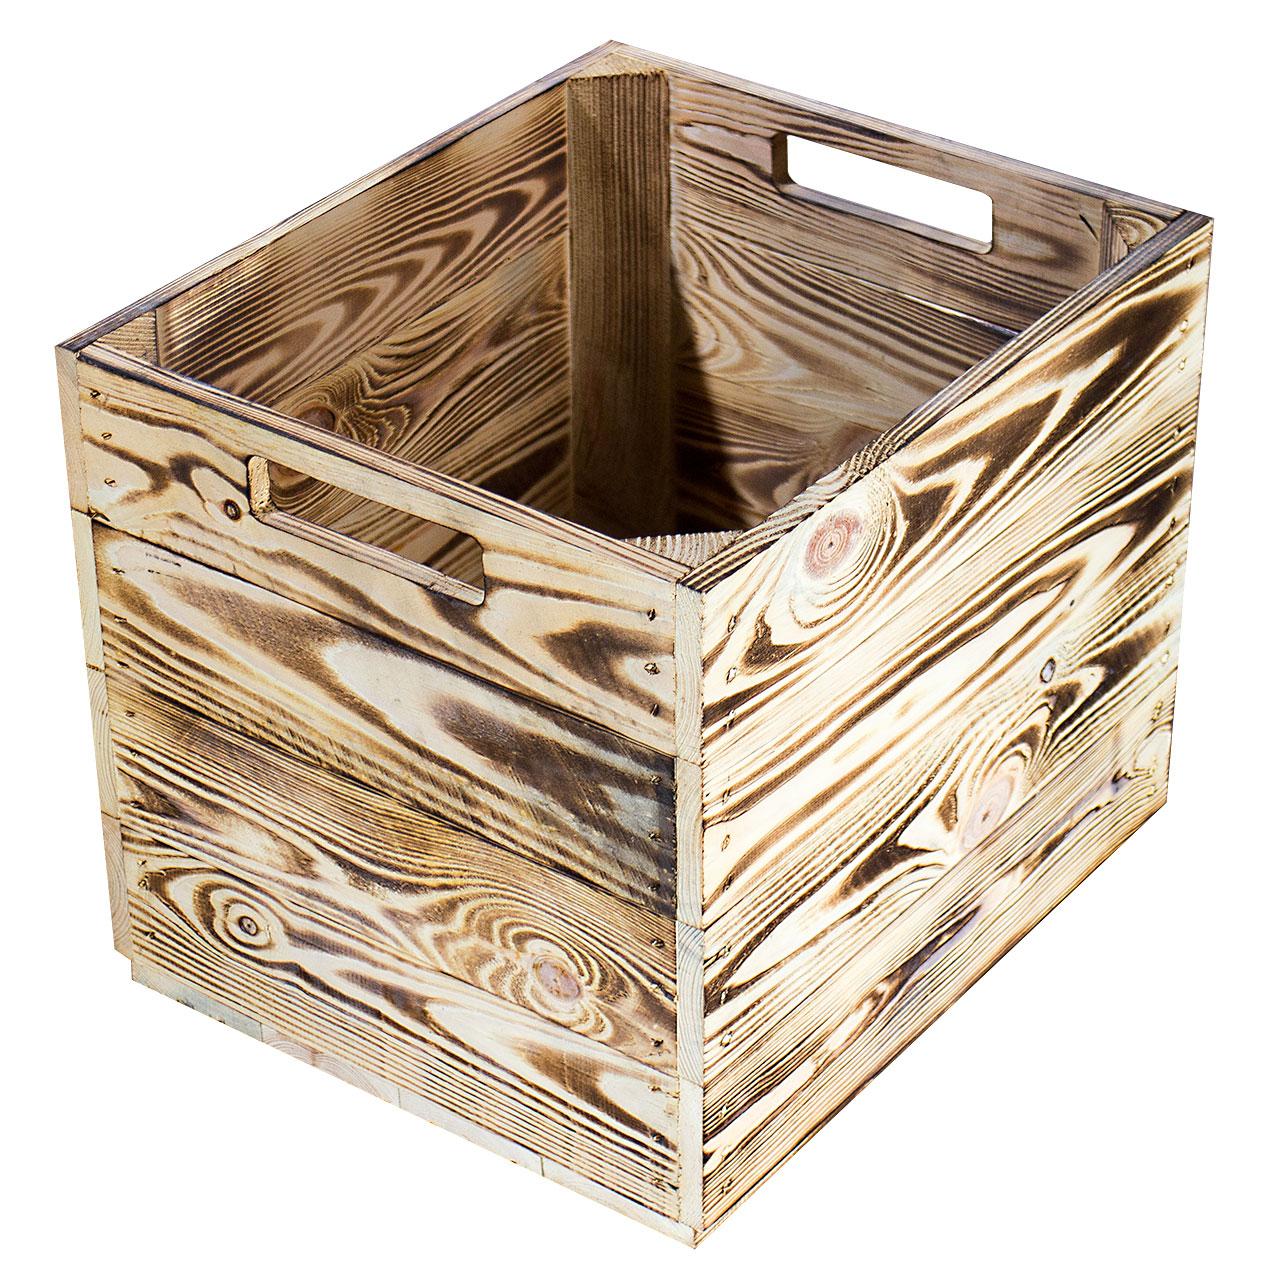 Geflammte Kiste für Kallax Regale 33x37,5x32,5cm